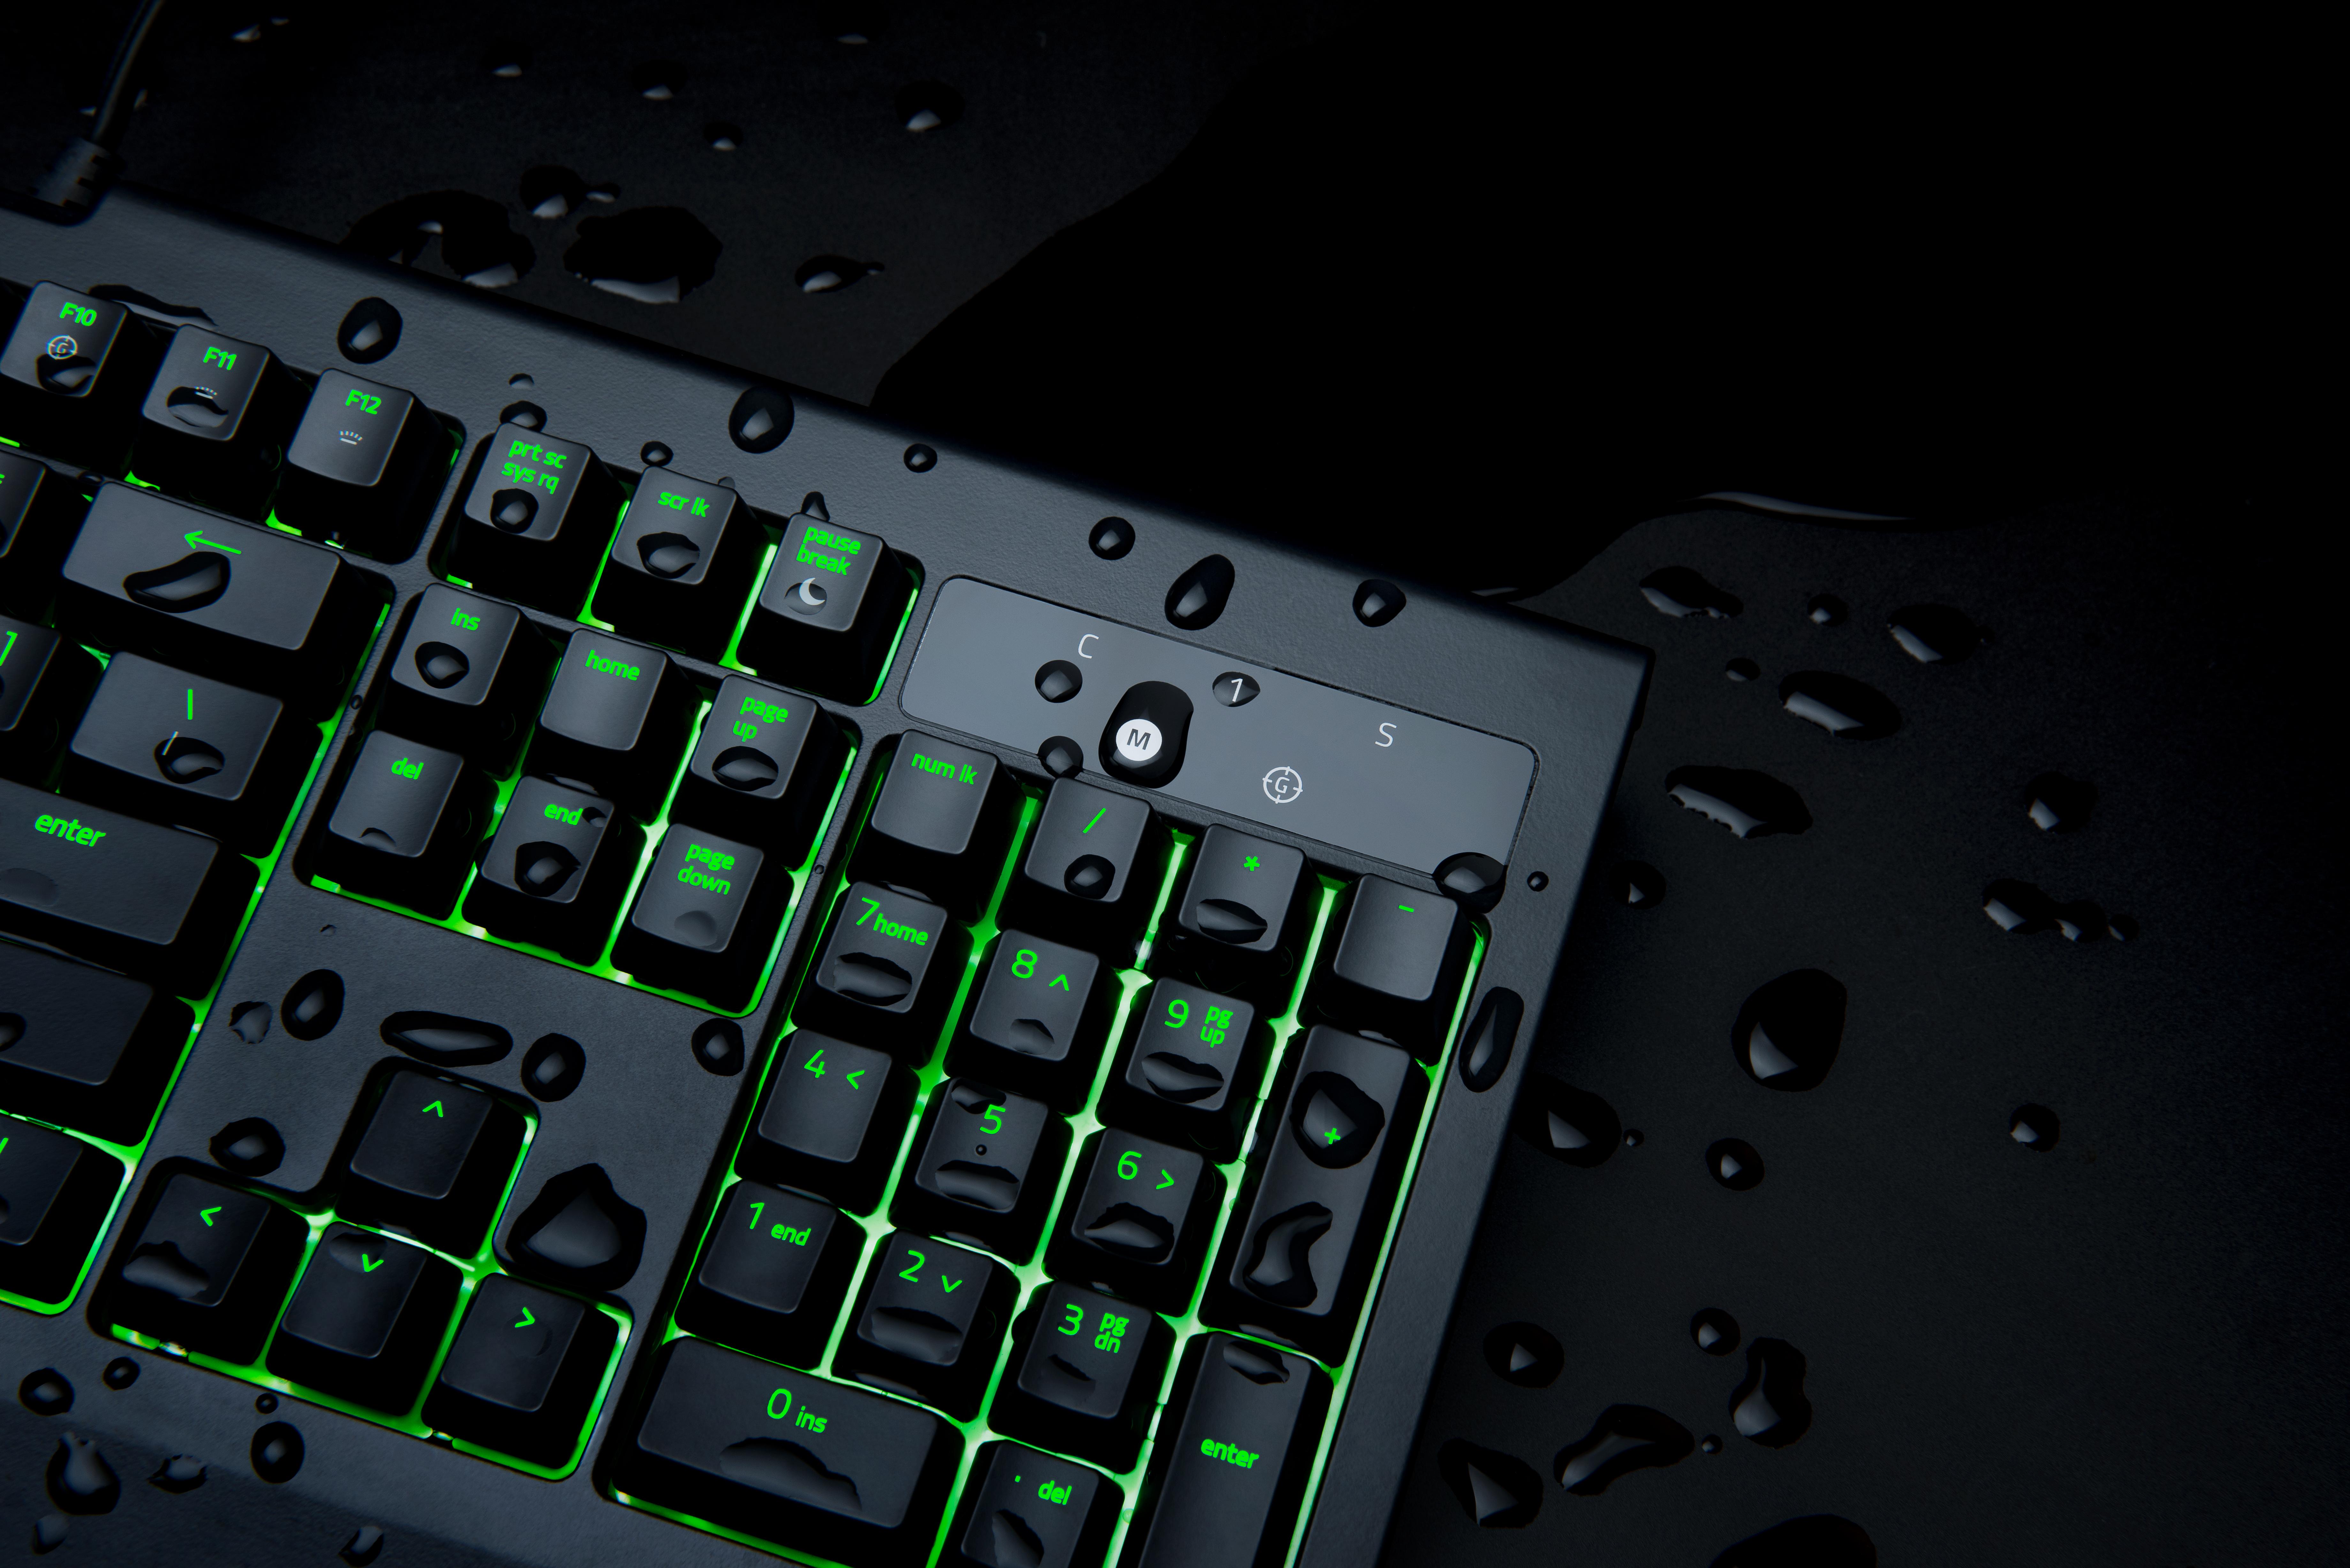 Razer Announces Blackwidow Ultimate Keyboard Ip54 Dust